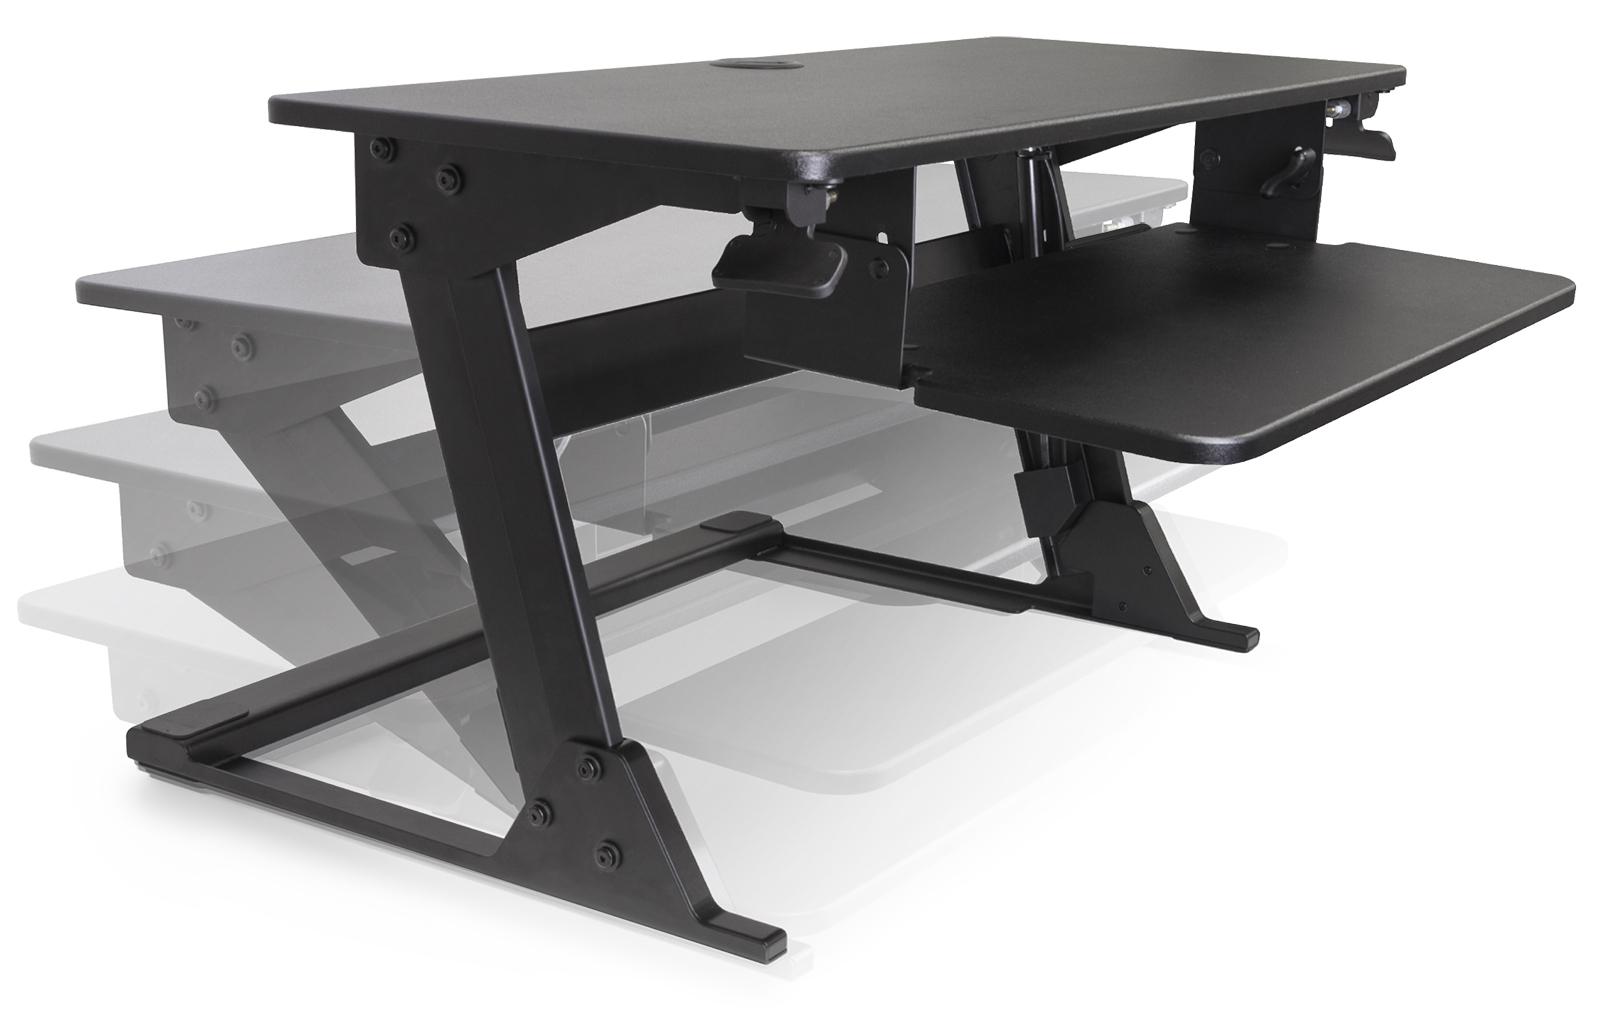 Volante Desktop Sit Stand Workstation By Kv Waterloo